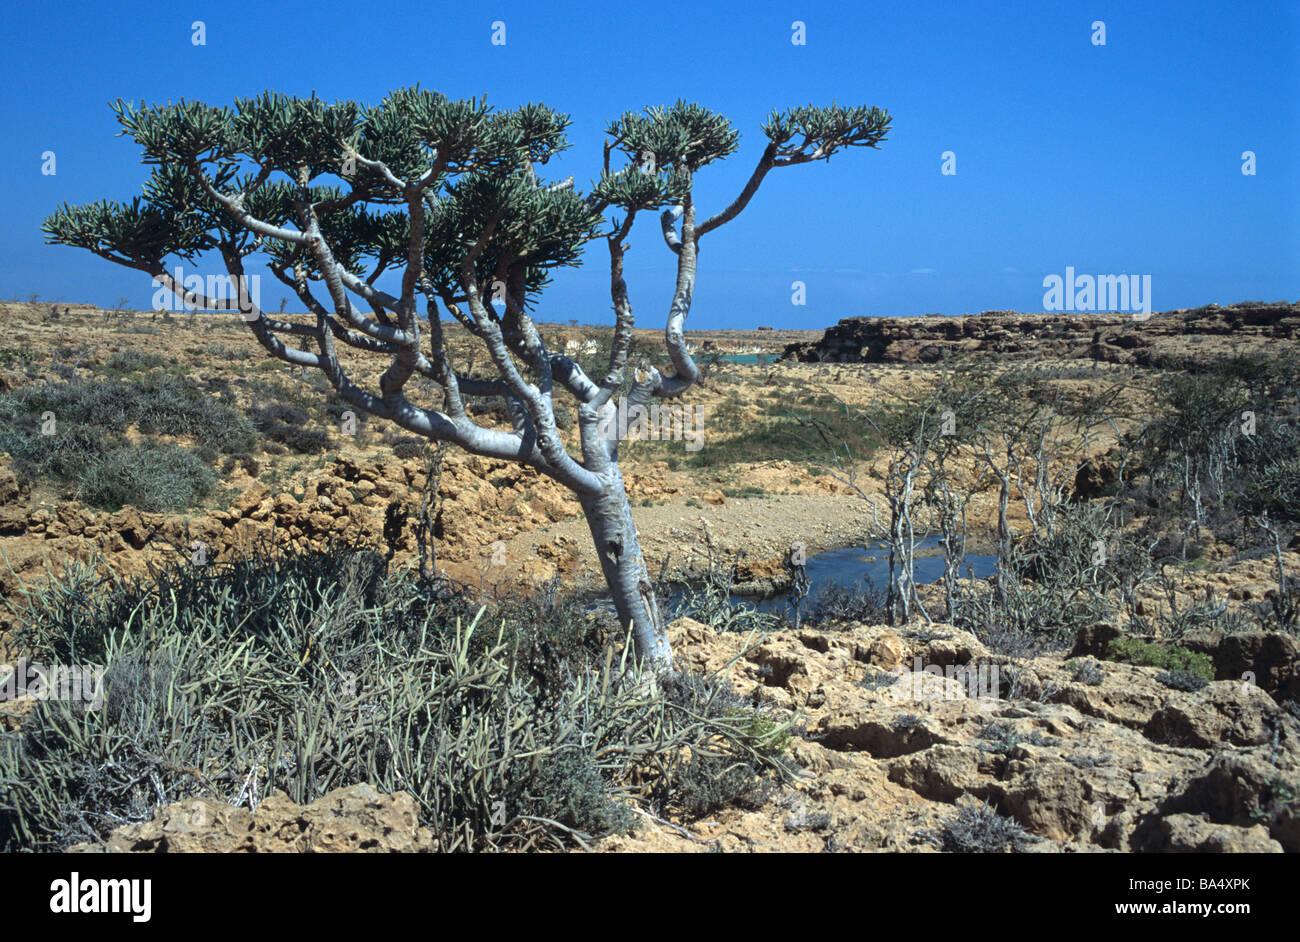 Euphorbia arbusculo & Coastal Inlet on north coast of Socotra or Suqutra, Yemen - Stock Image